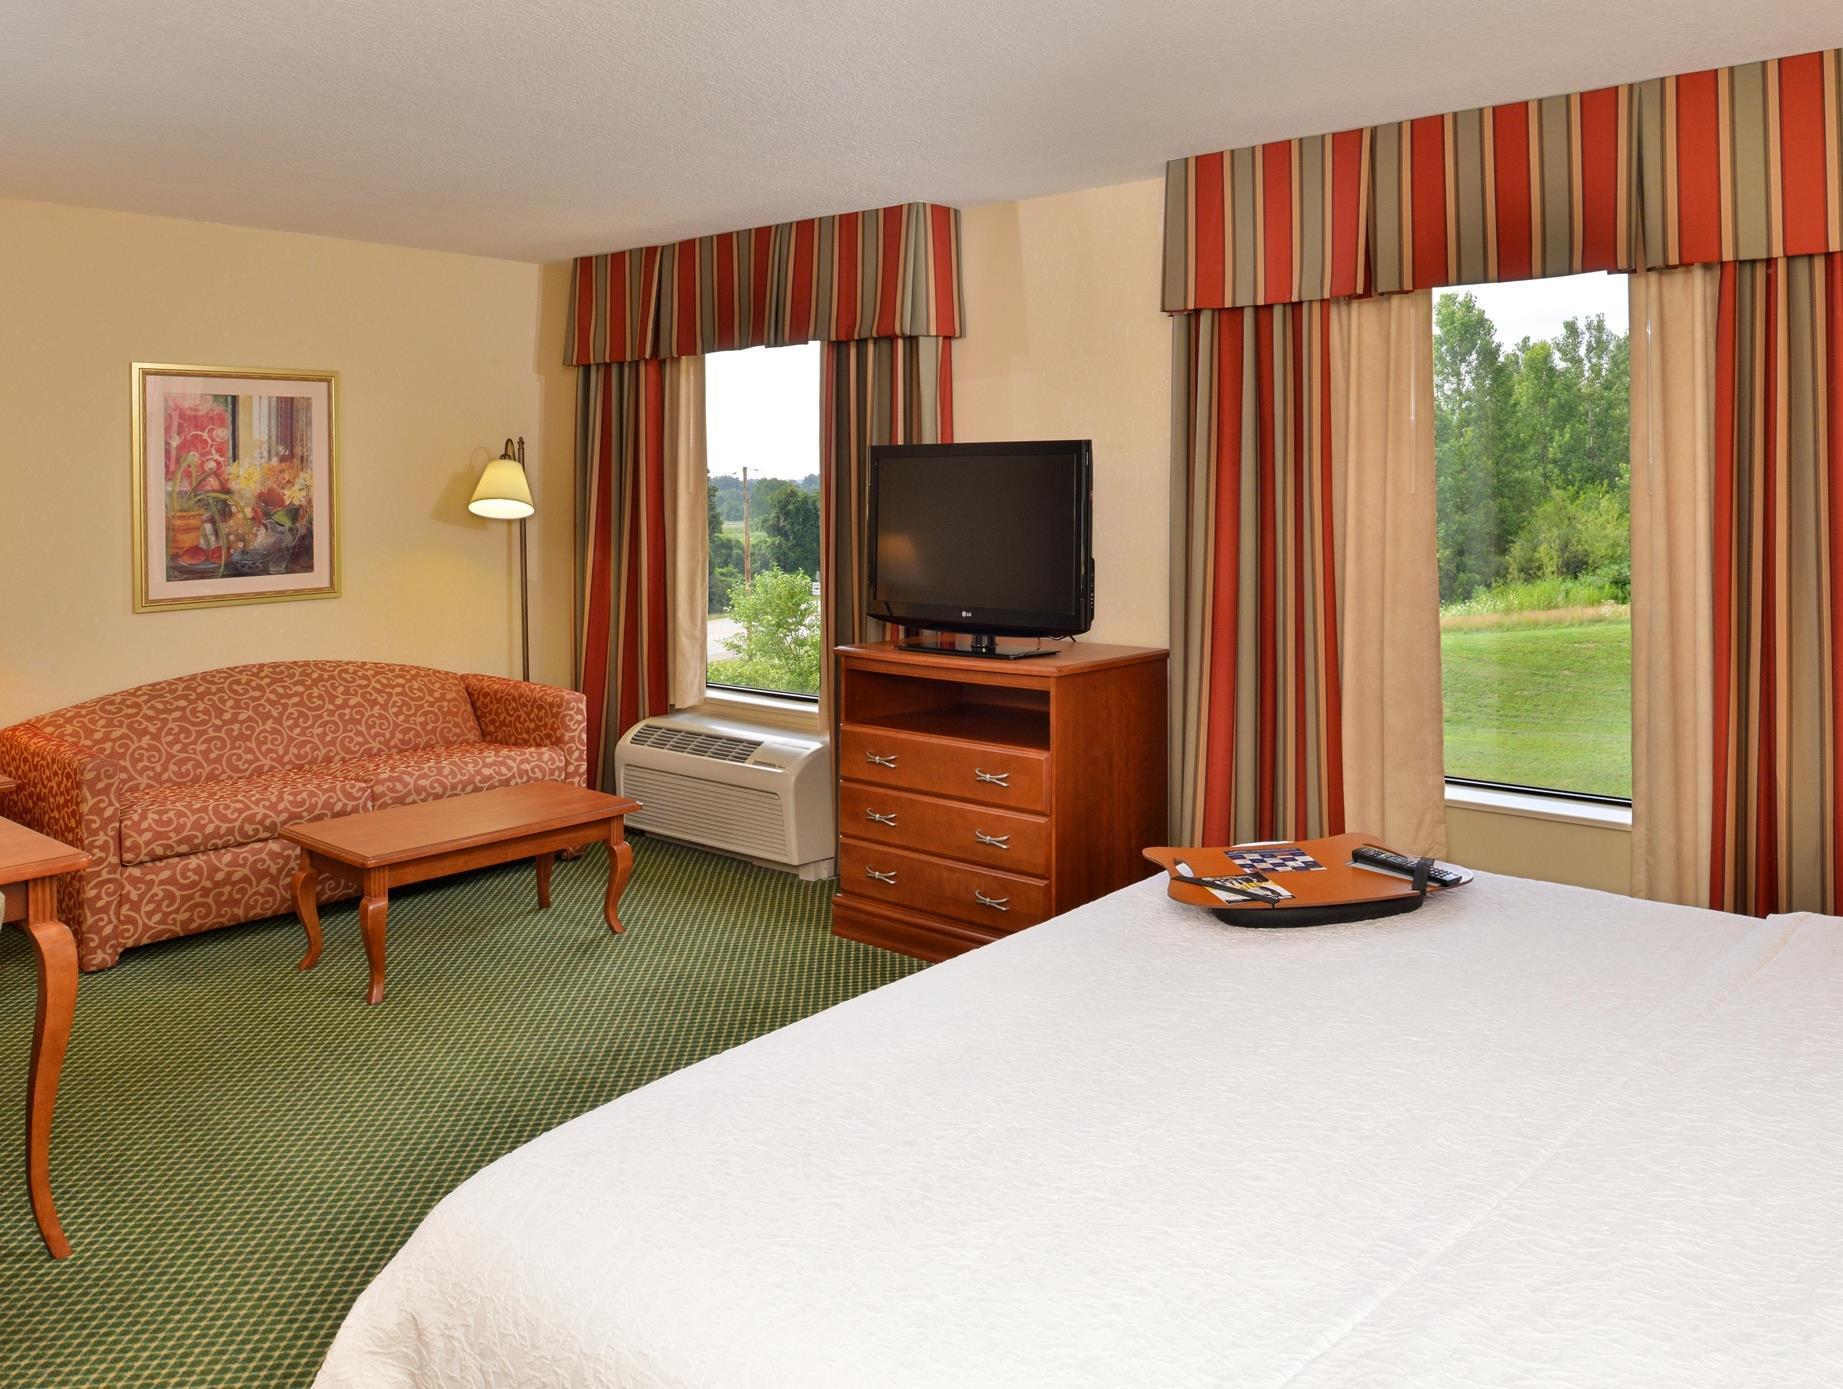 Hampton Inn And Suites St. Louis Edwardsville